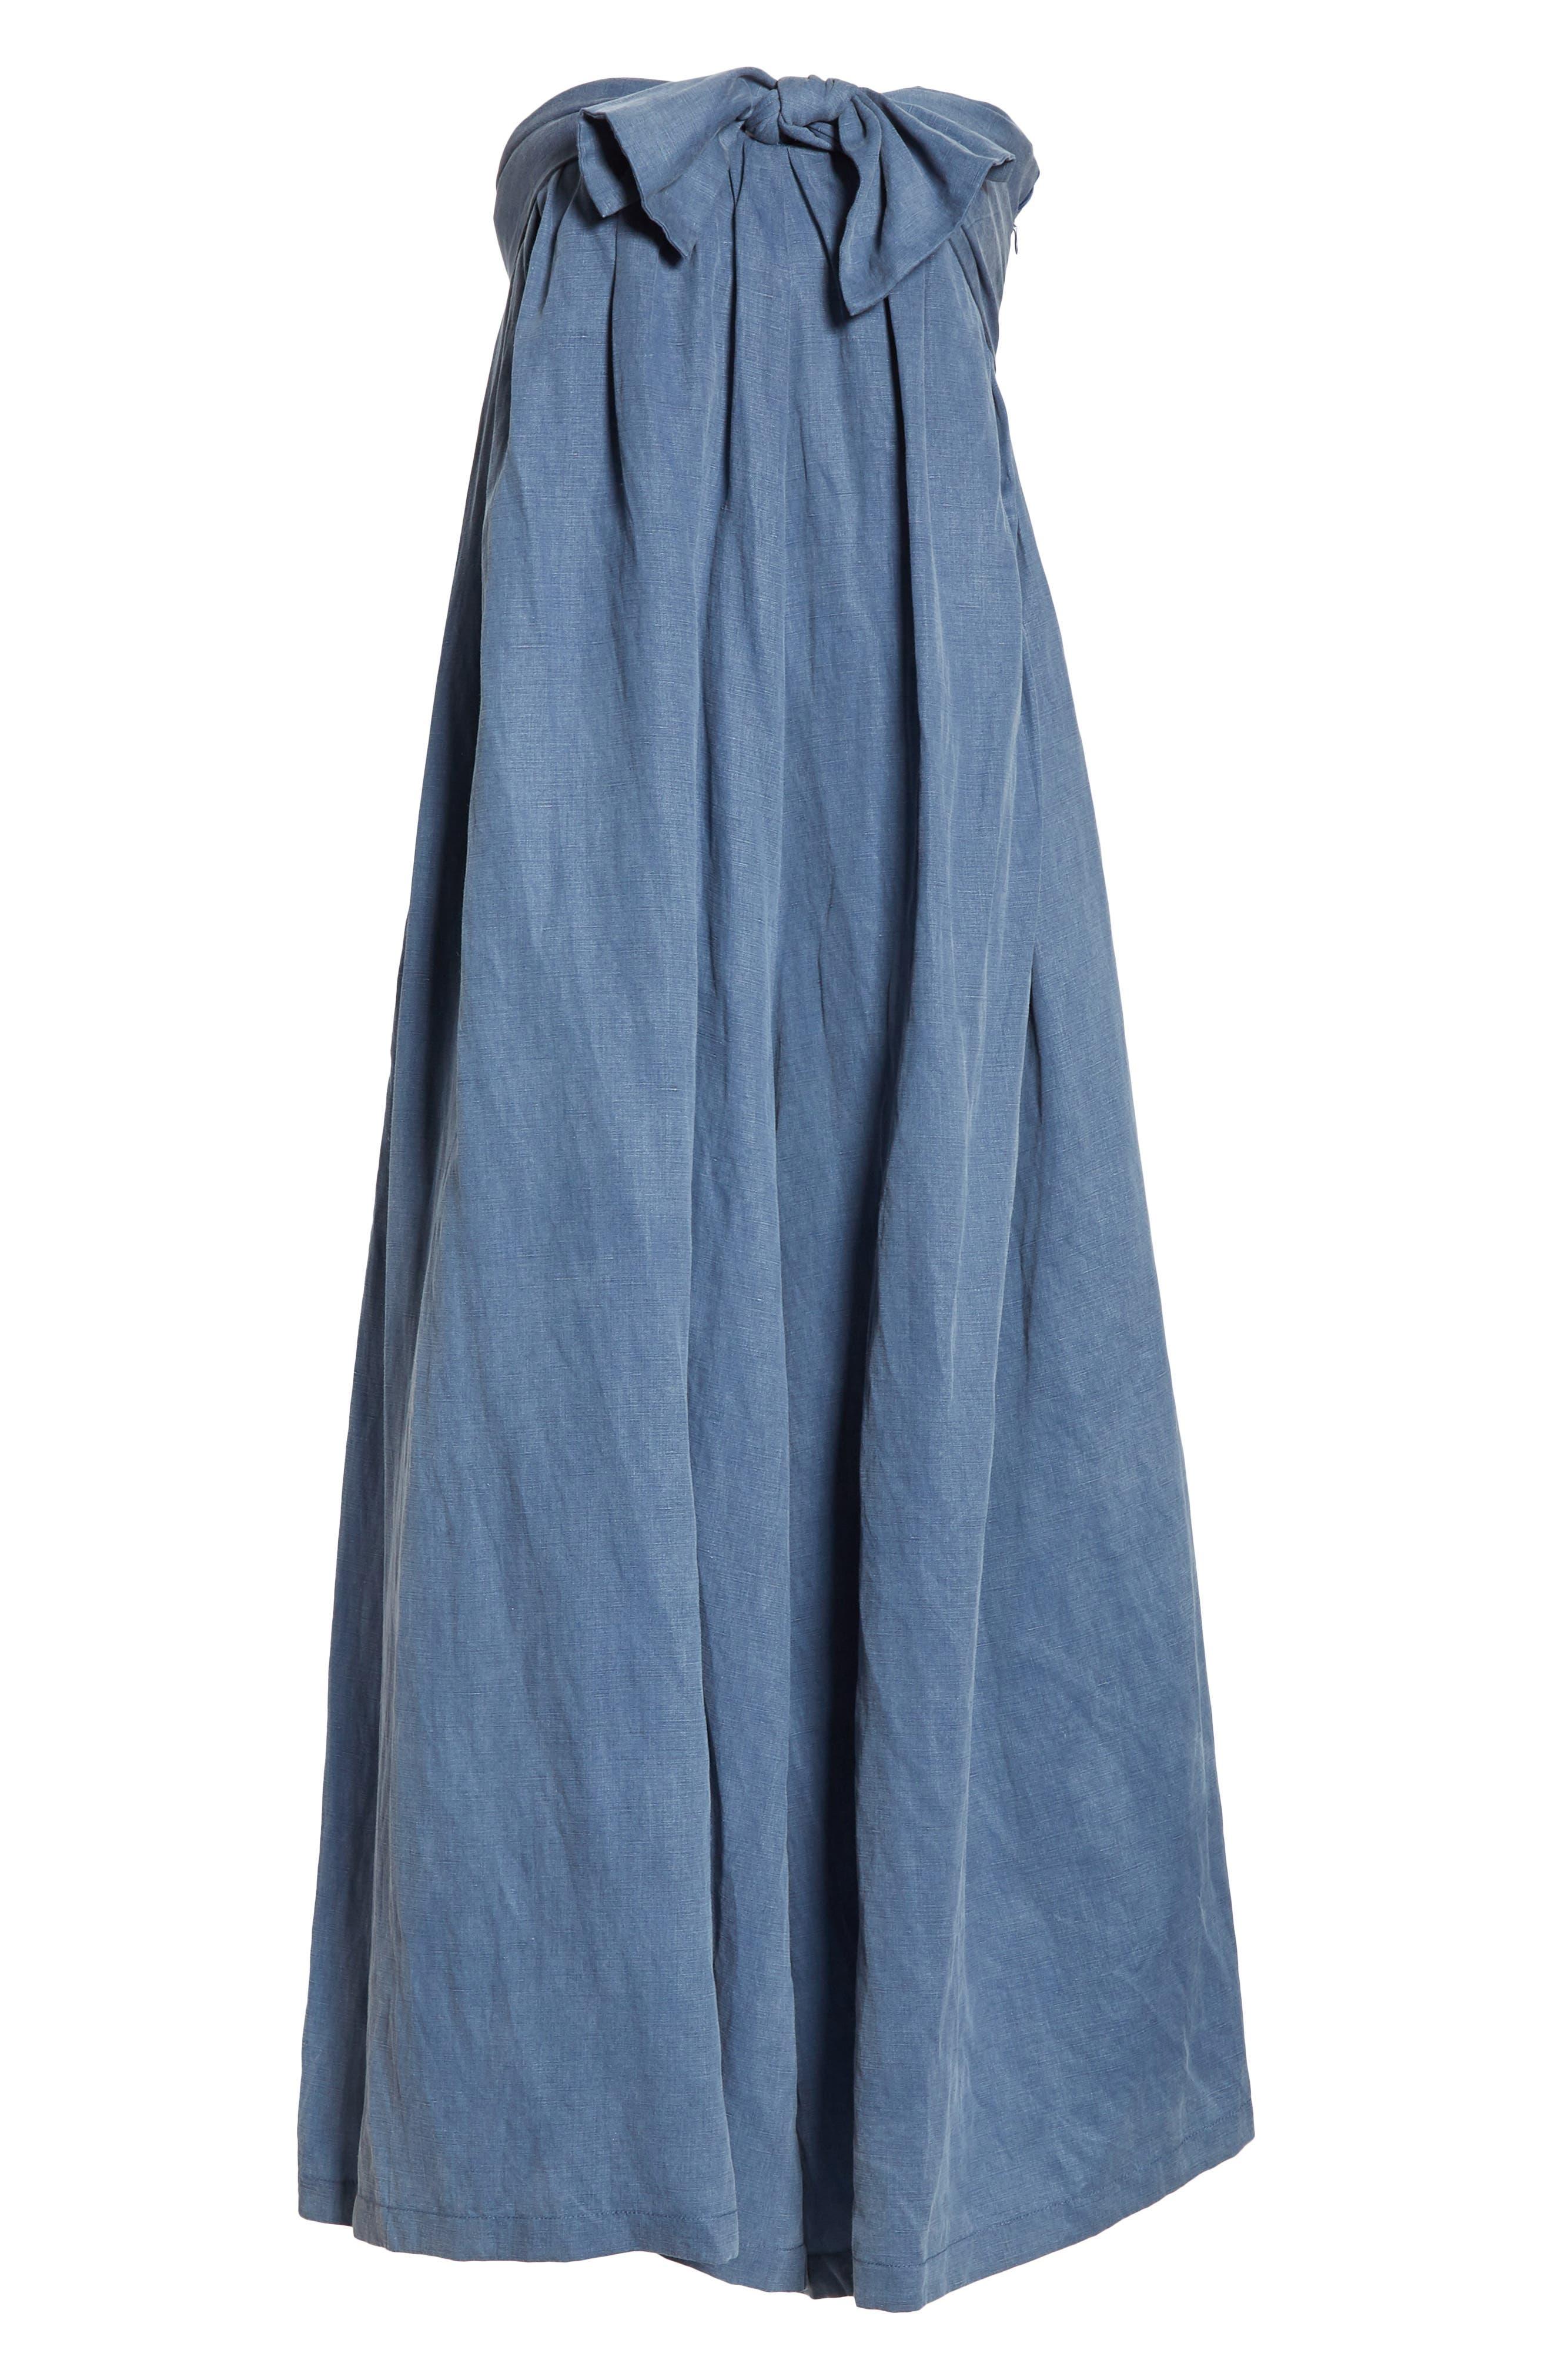 ULLA JOHNSON, Jordane Strapless Wide Leg Jumpsuit, Alternate thumbnail 6, color, CHAMBRAY